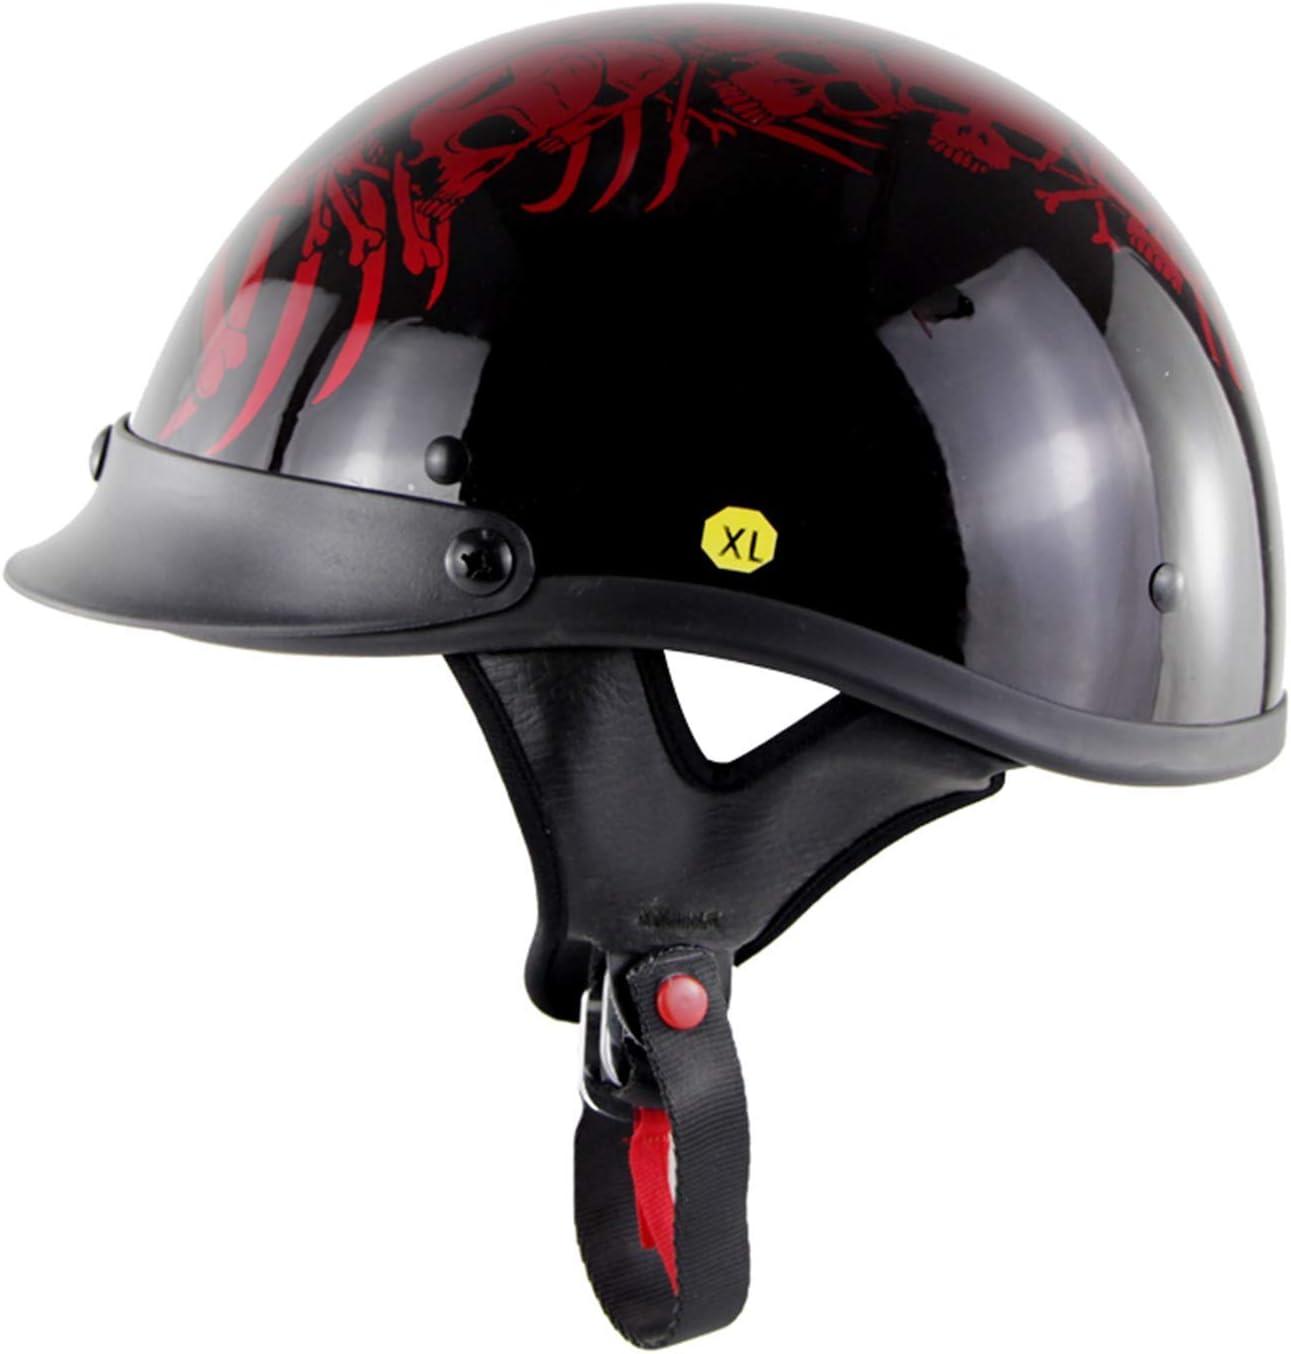 retro half helmet Harley helmet cruiser scooter DOT approved for men and women half helmet,Red,M YLee Open motorcycle helmet